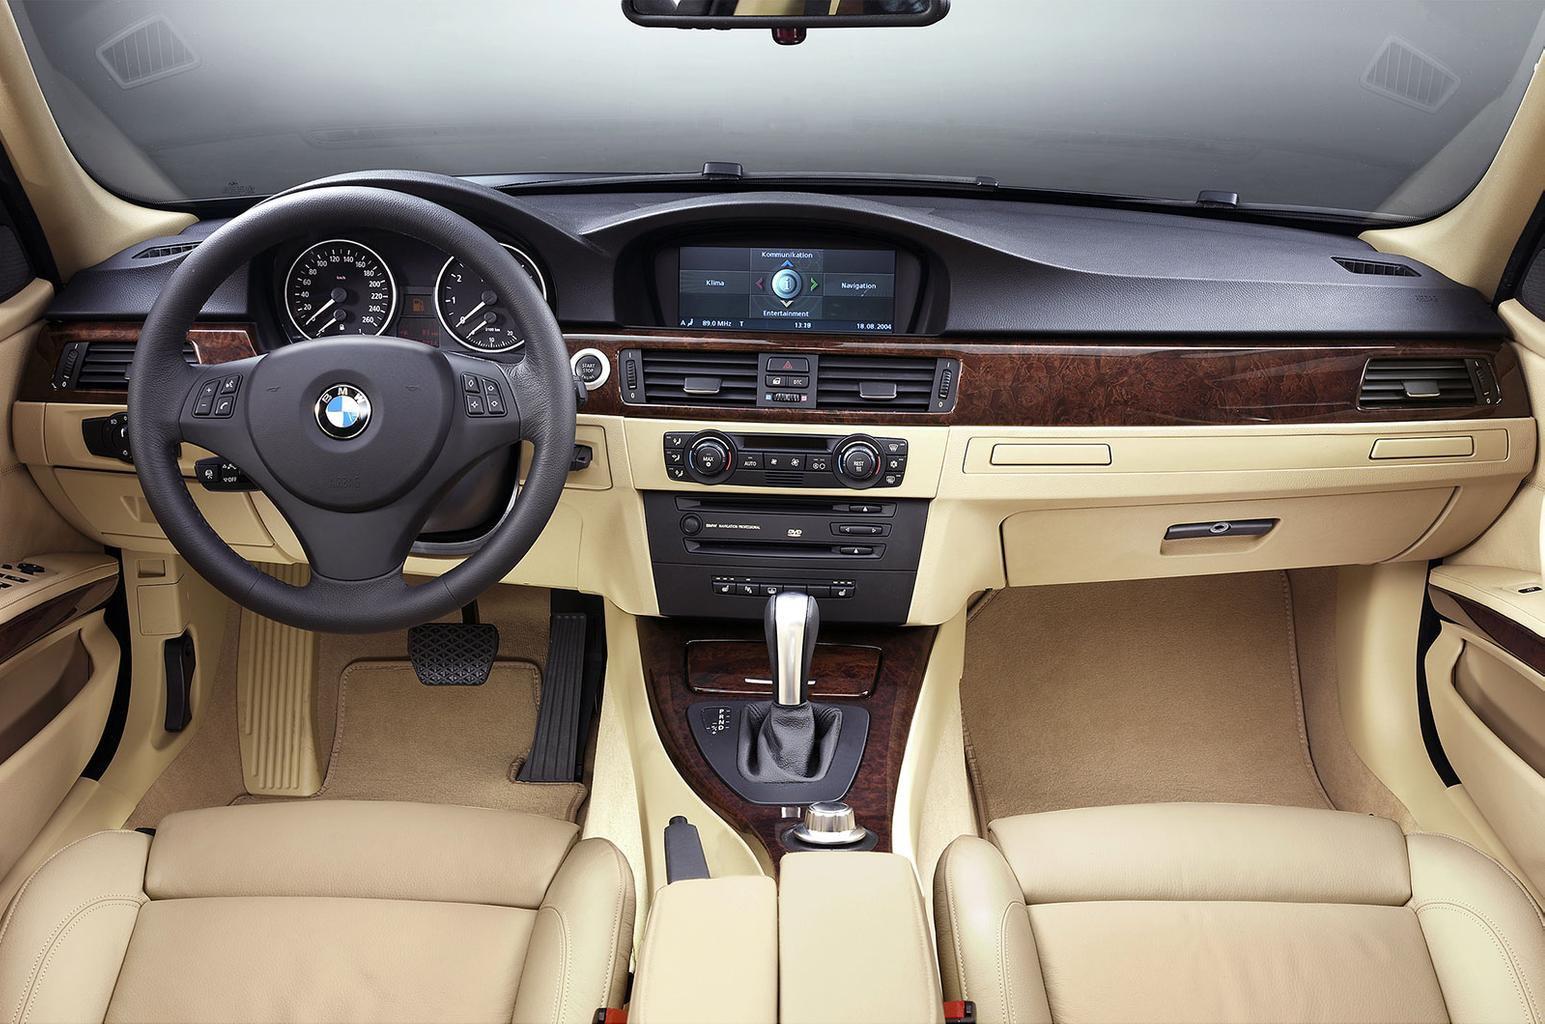 Used BMW 3 Series interior